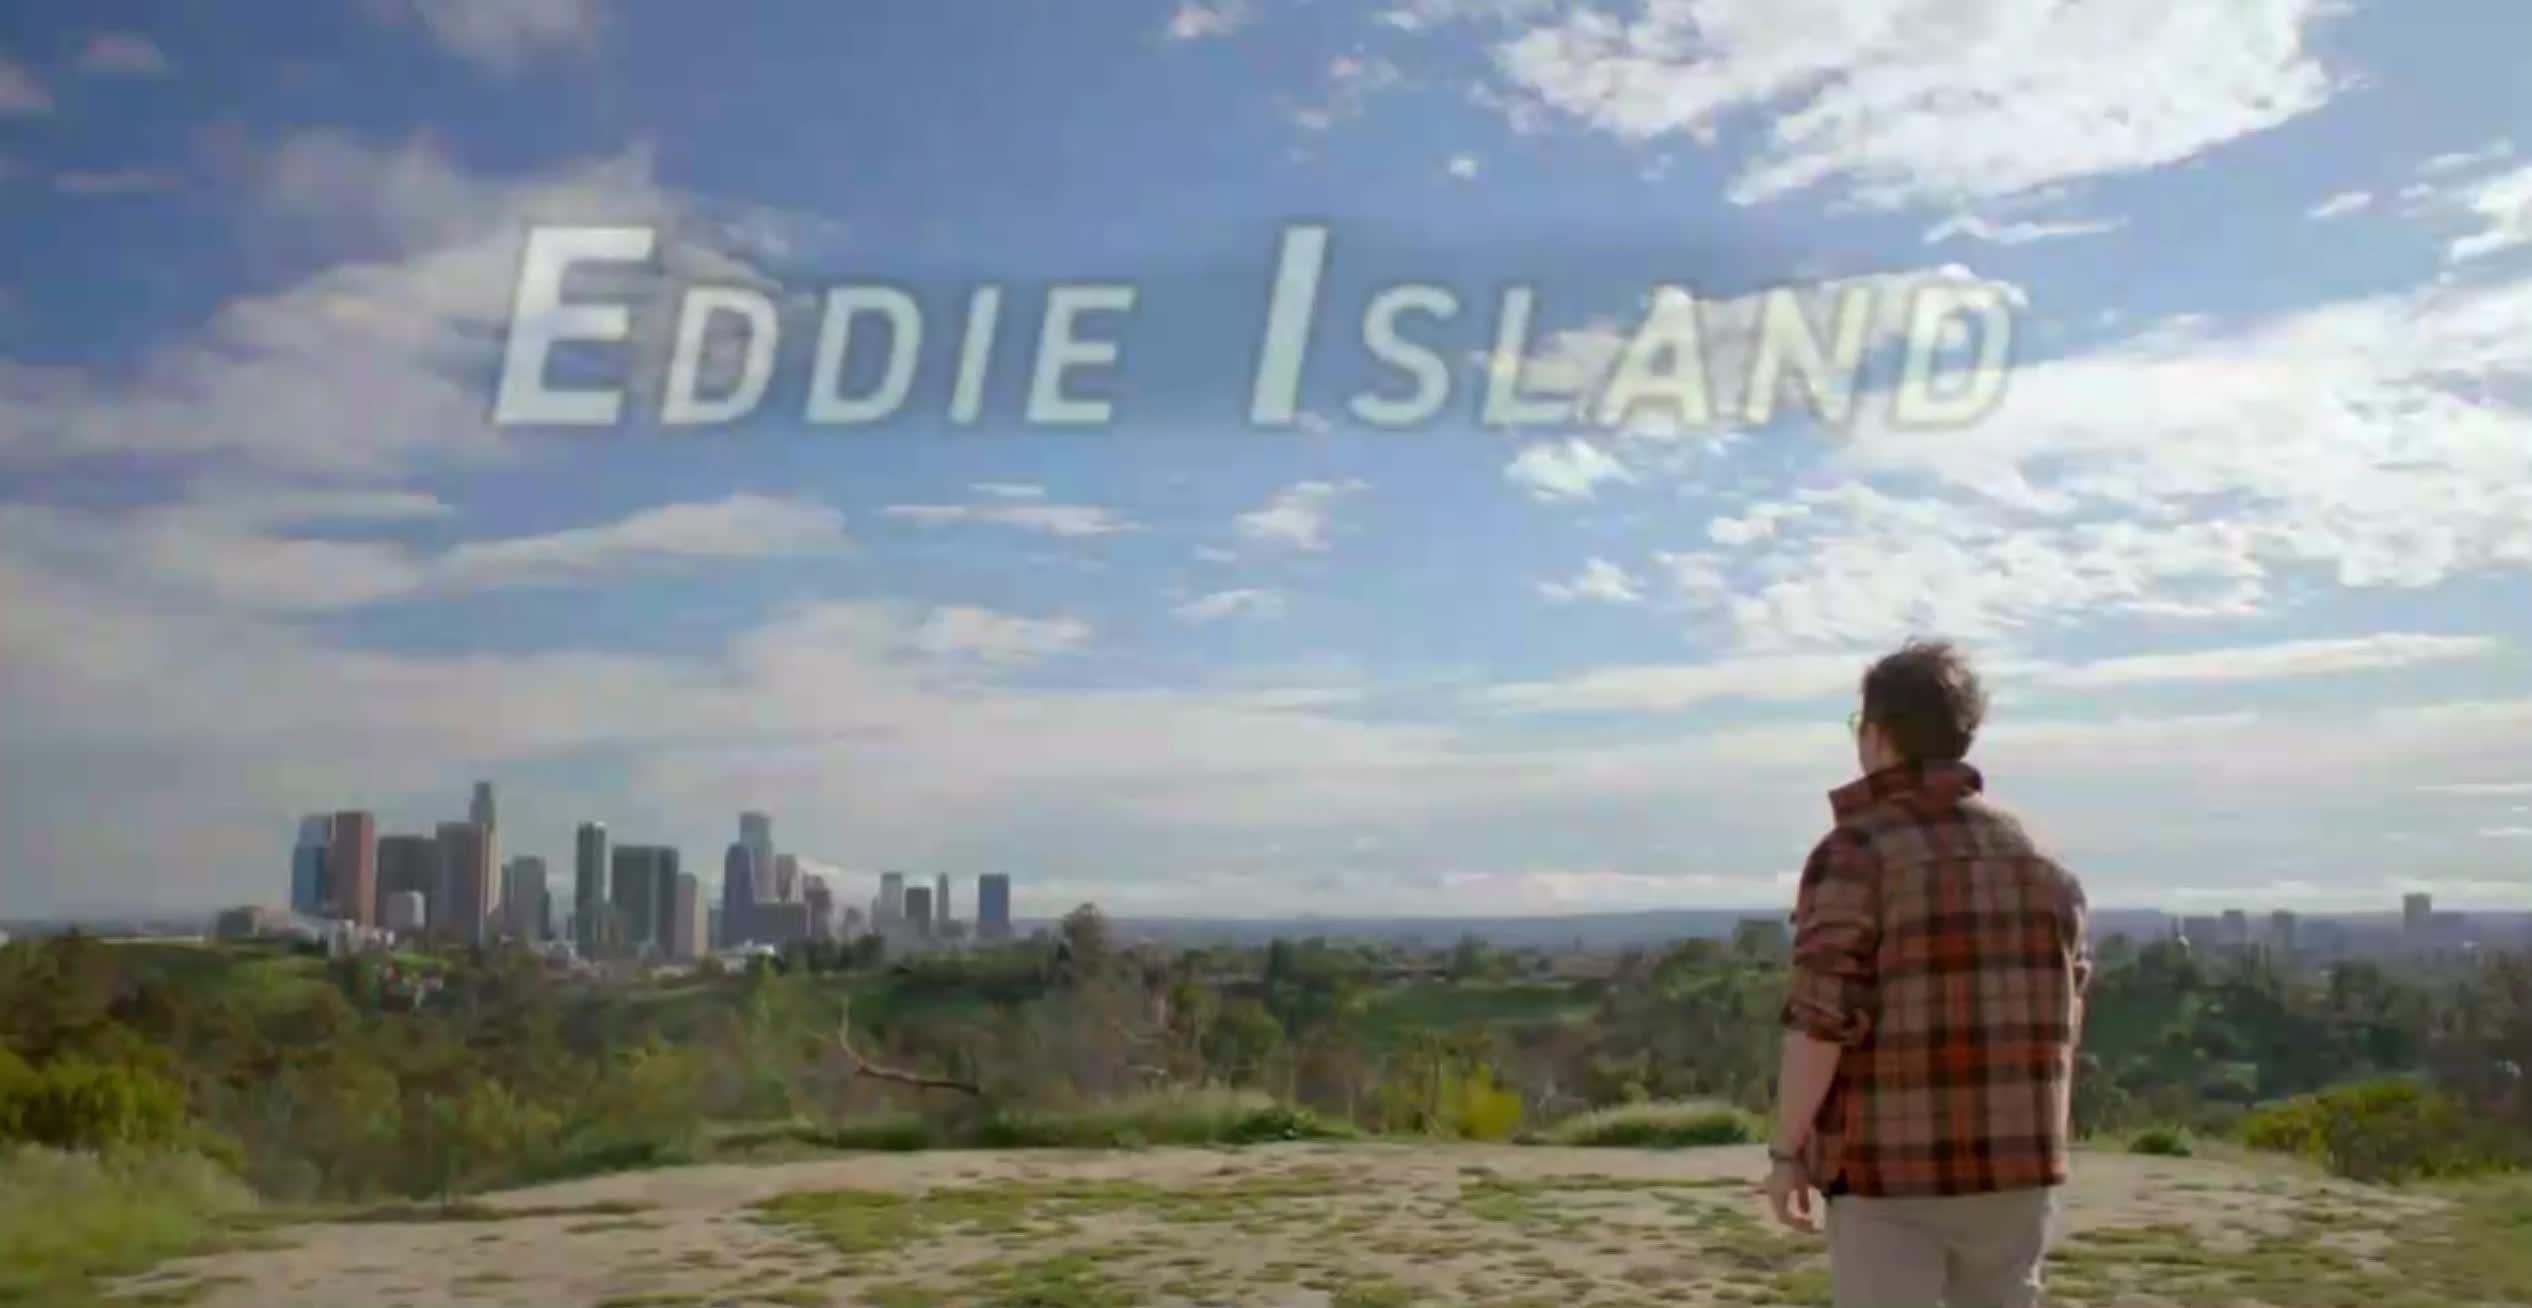 american idol, american idol season 17, americanidol, eddie island, katy perry, lionel richie, luke bryan, ryan seacrest, season 17, American Idol Eddie Island GIFs